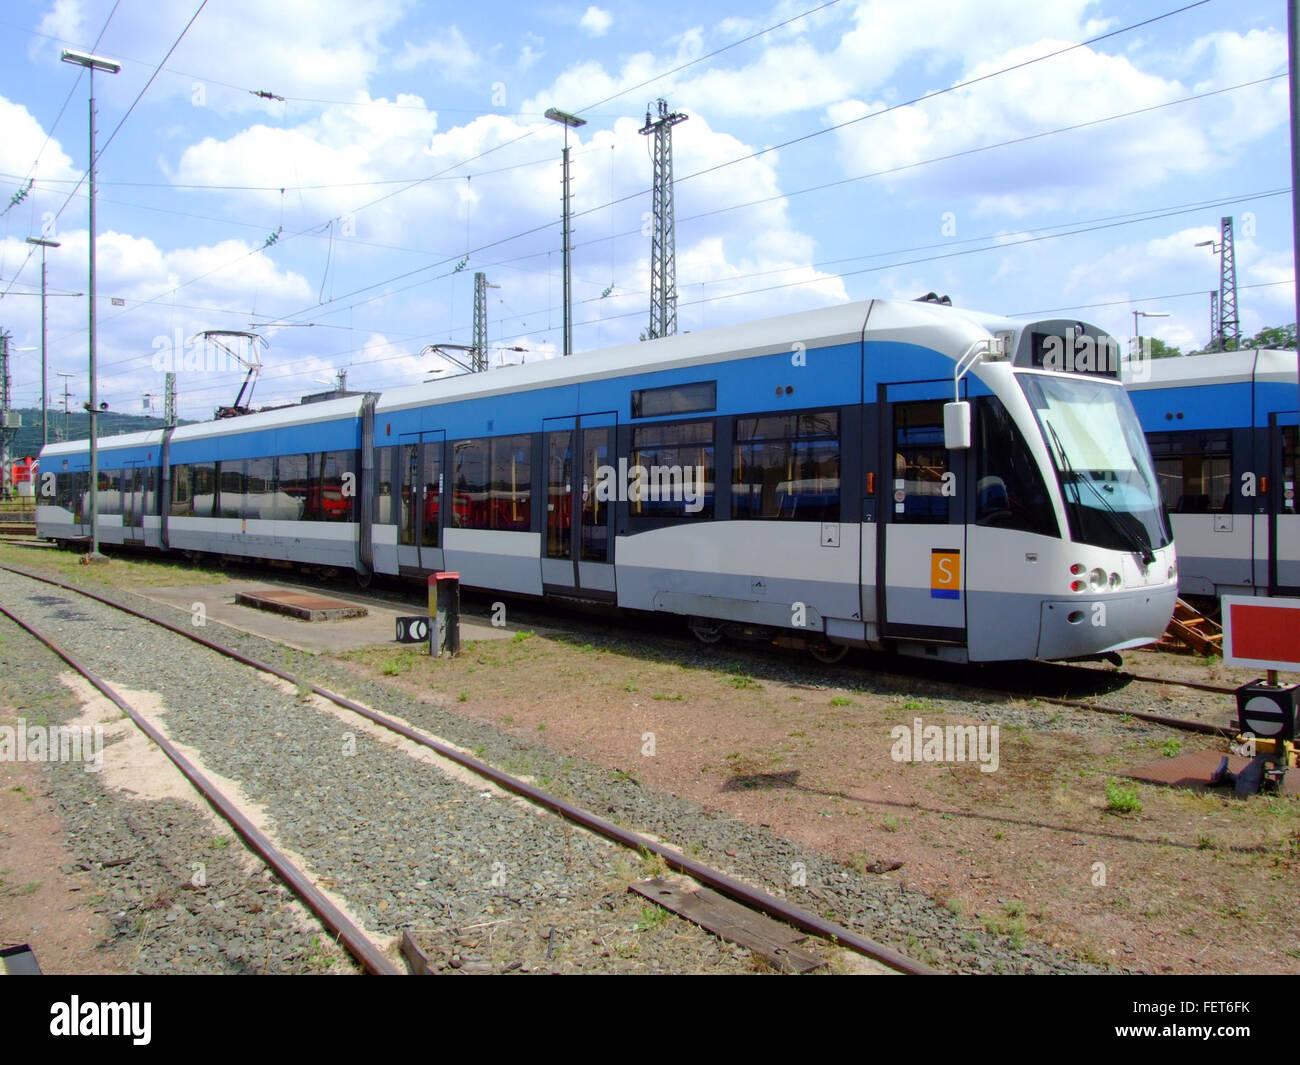 Siemens Tram Saarbruecken 1017B p1 Stock Photo, Royalty ...